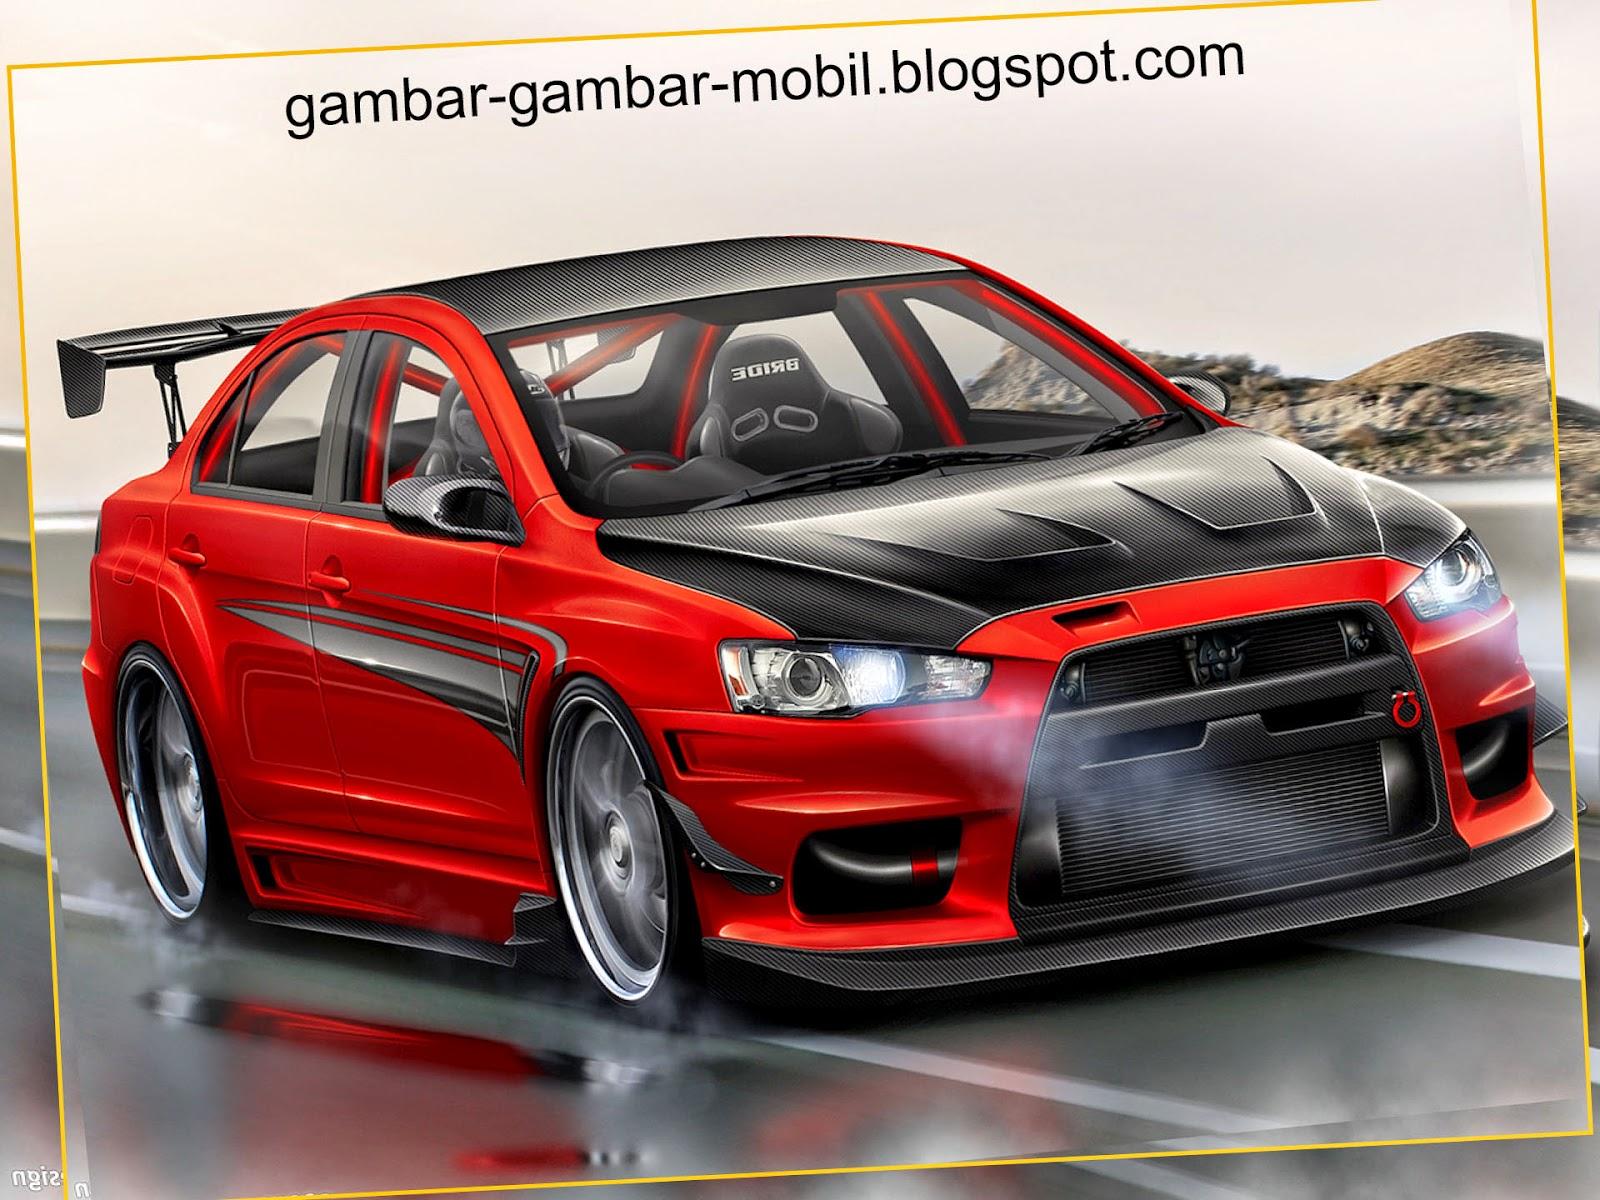 Gambar Mobil Modifikasi Mitsubishi Lancer Modifikasi Mobil